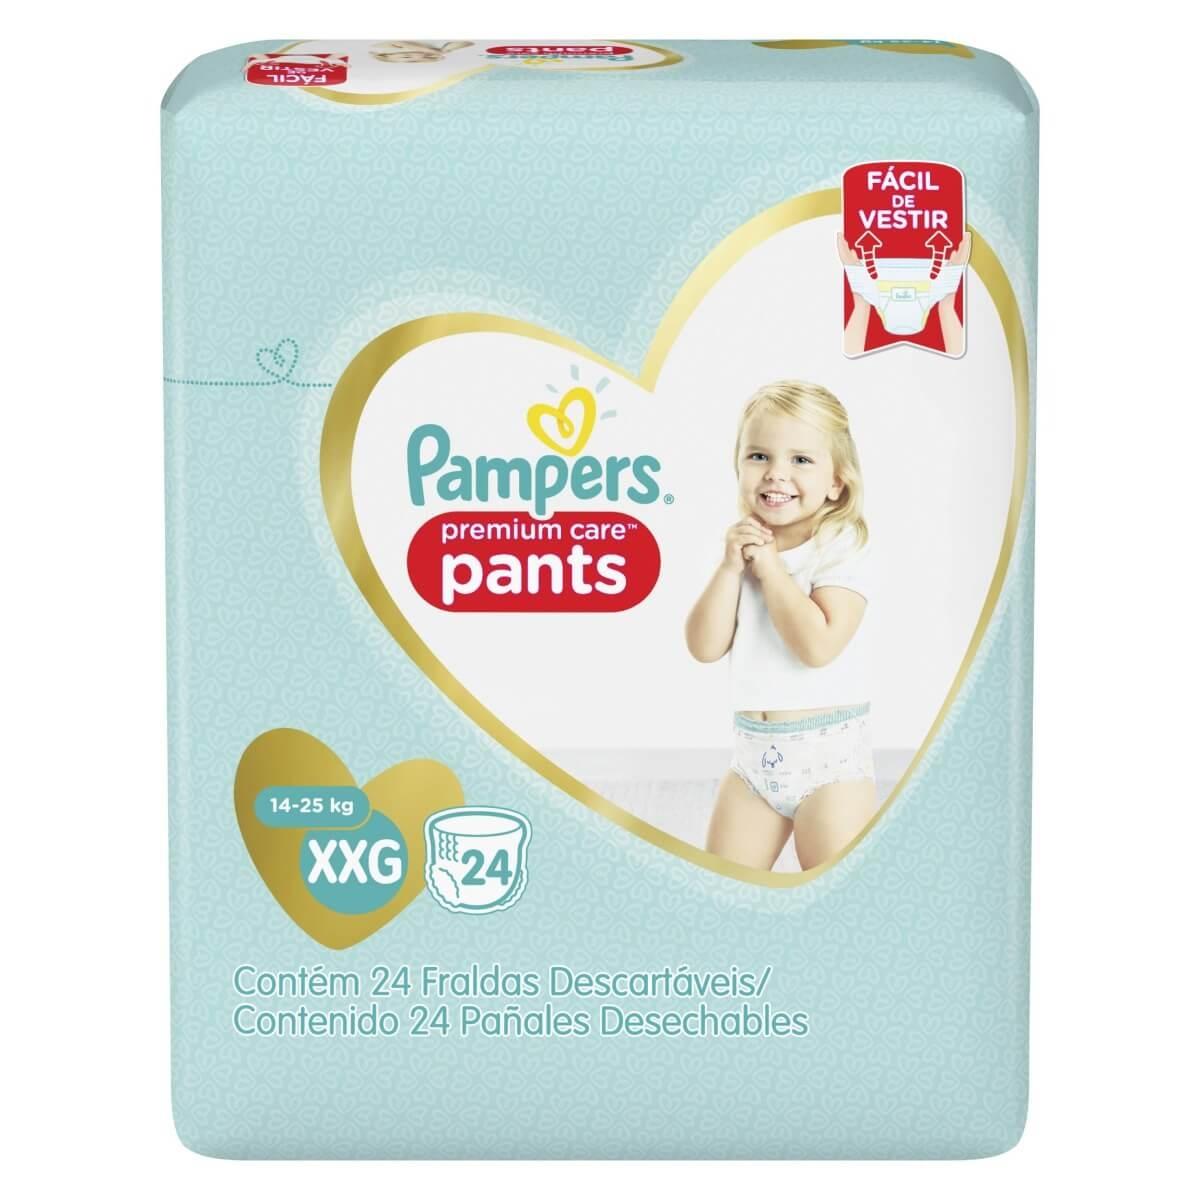 Fralda Pampers Premium Care Pants Tamanho XXG 24 Tiras